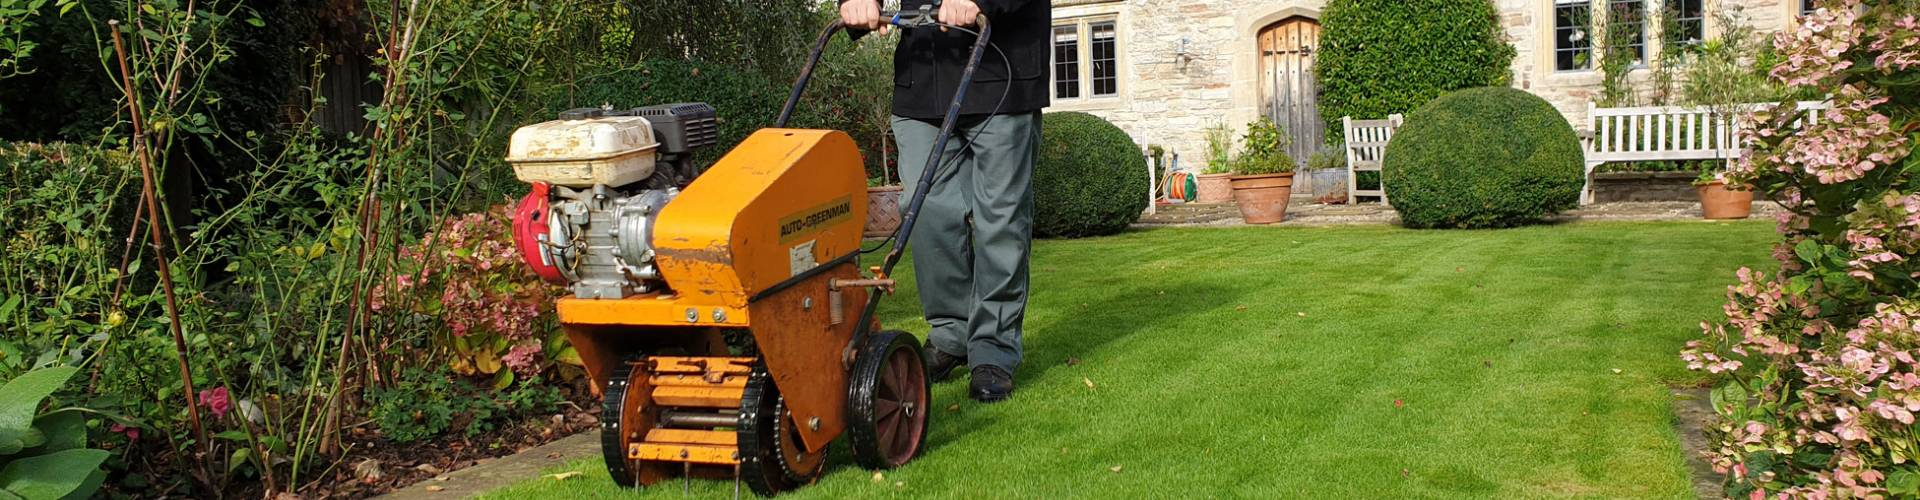 Lawn Care Services in: Wells, Street, Glastonbury, Cheddar.